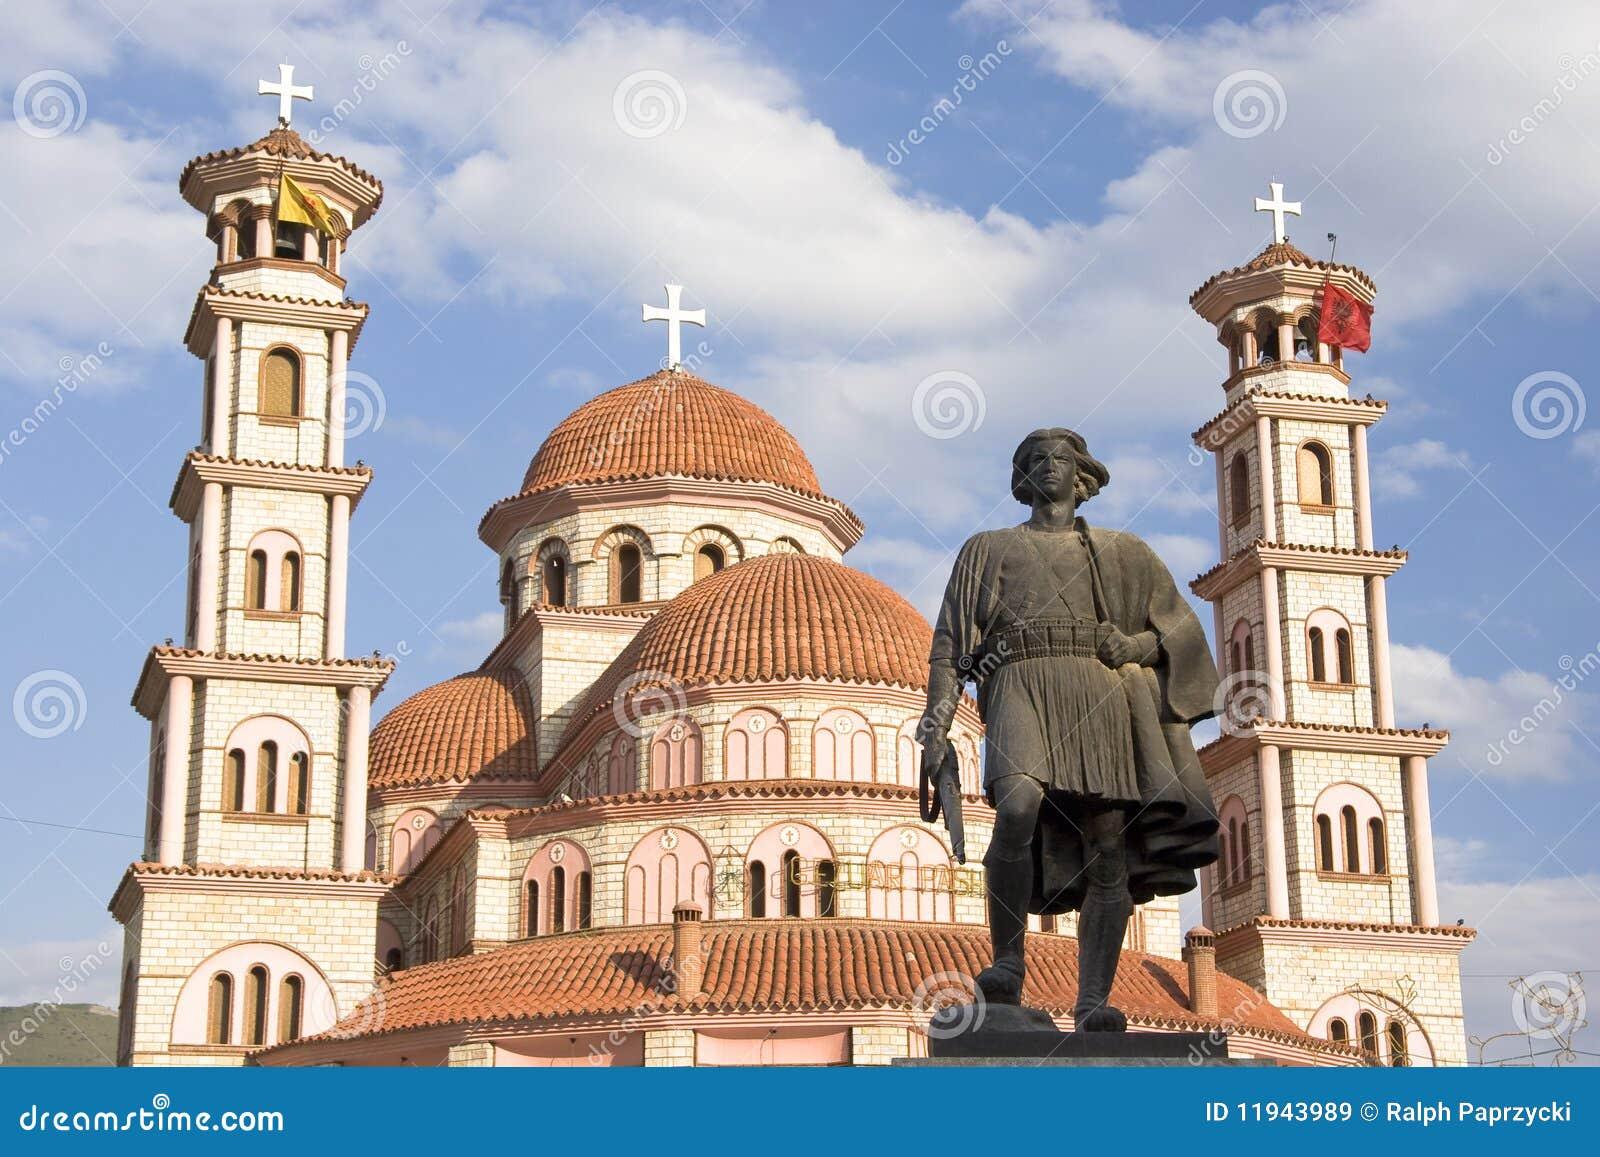 Statue und orthodoxe Kirche, Korca, Albanien